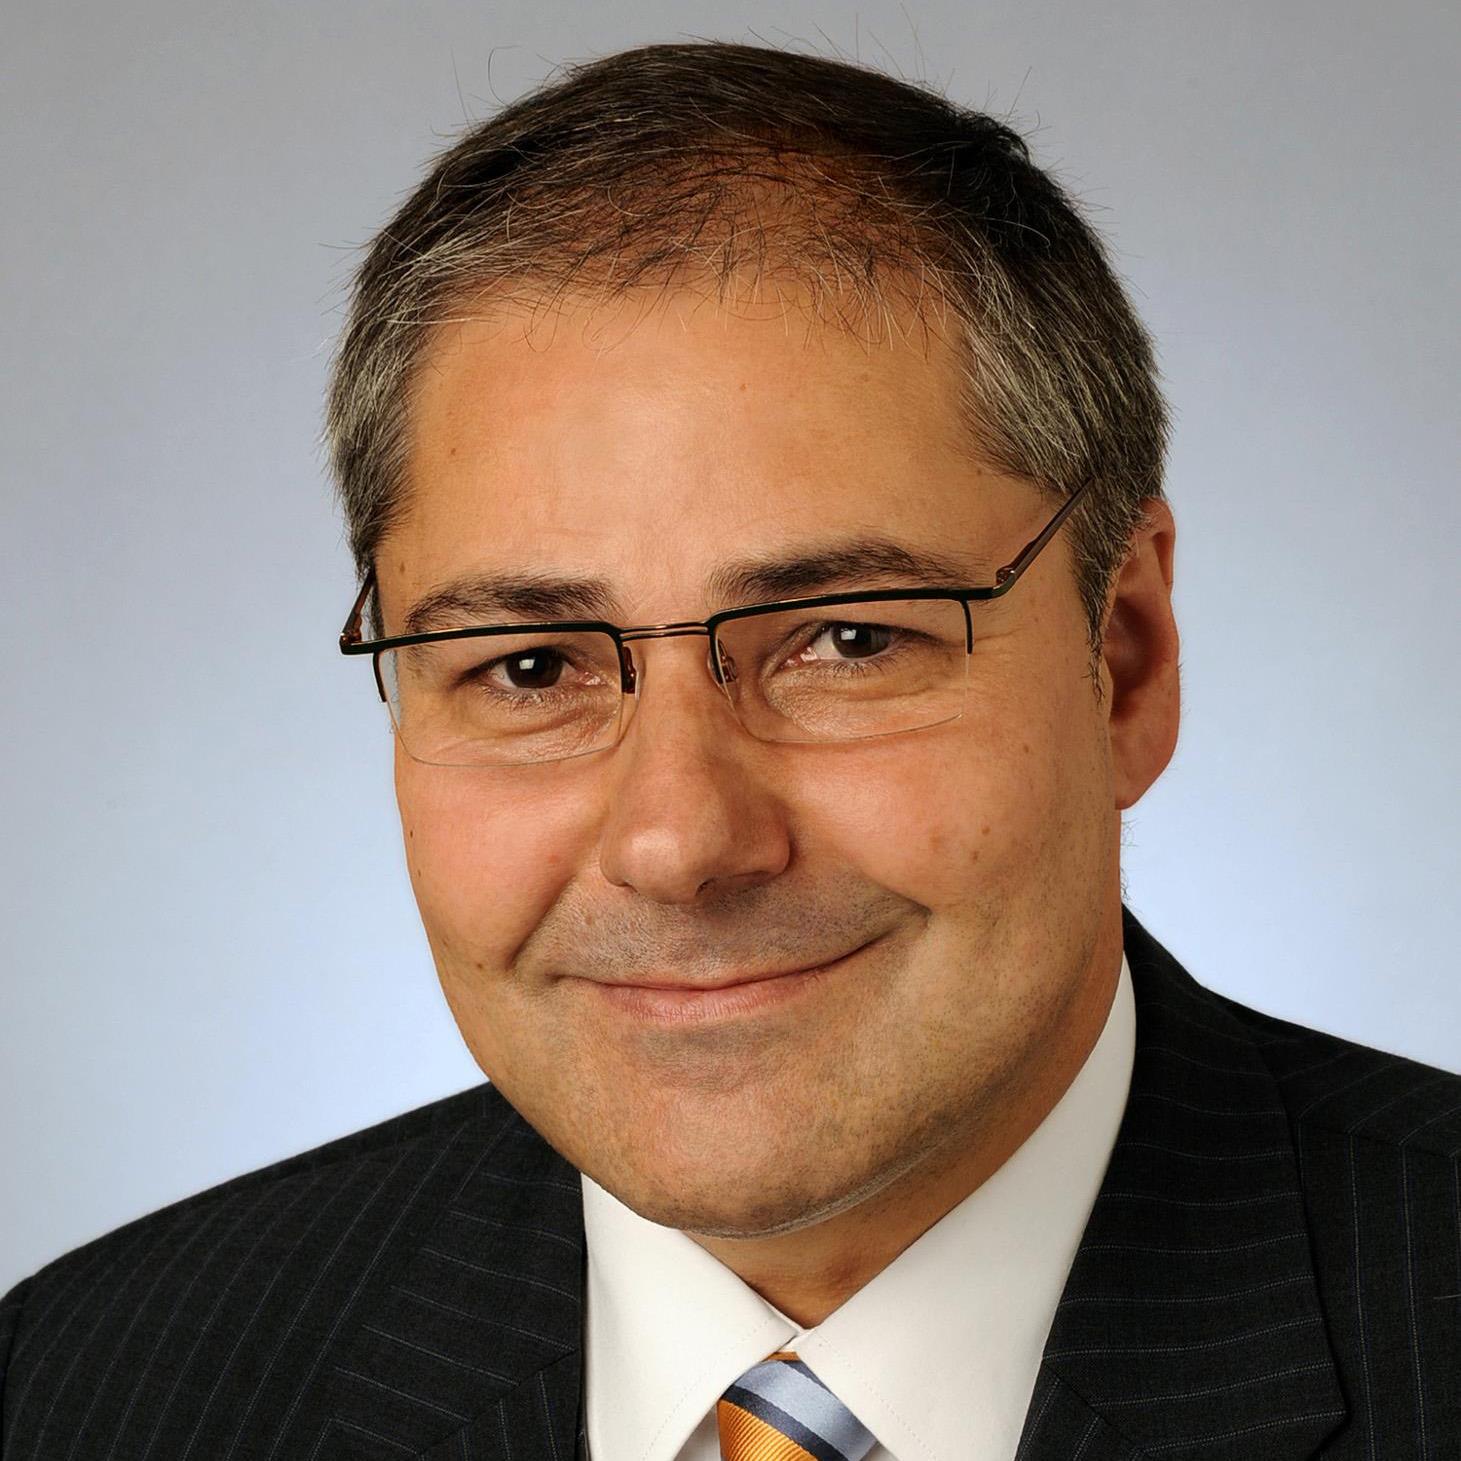 Michael Arntzen